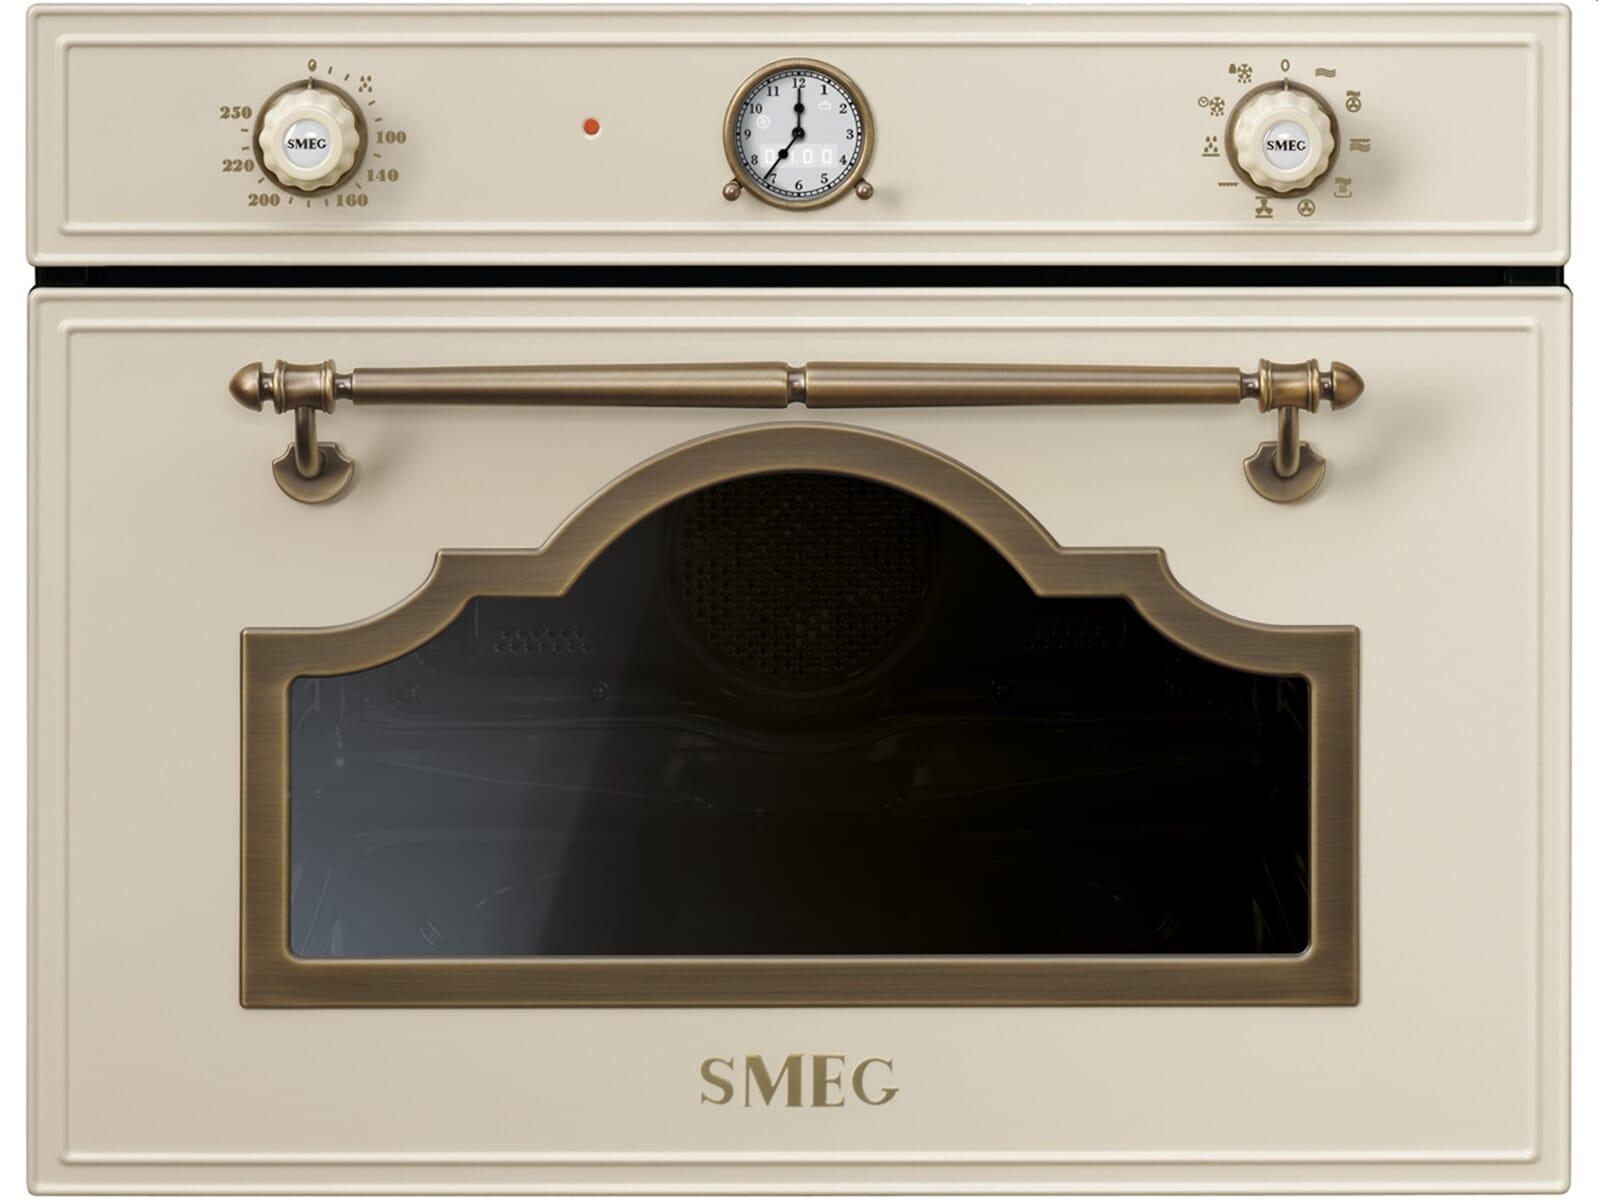 Produktabbildung Smeg SF4750MCPO Kompakt Backofen mit Mikrowelle Creme